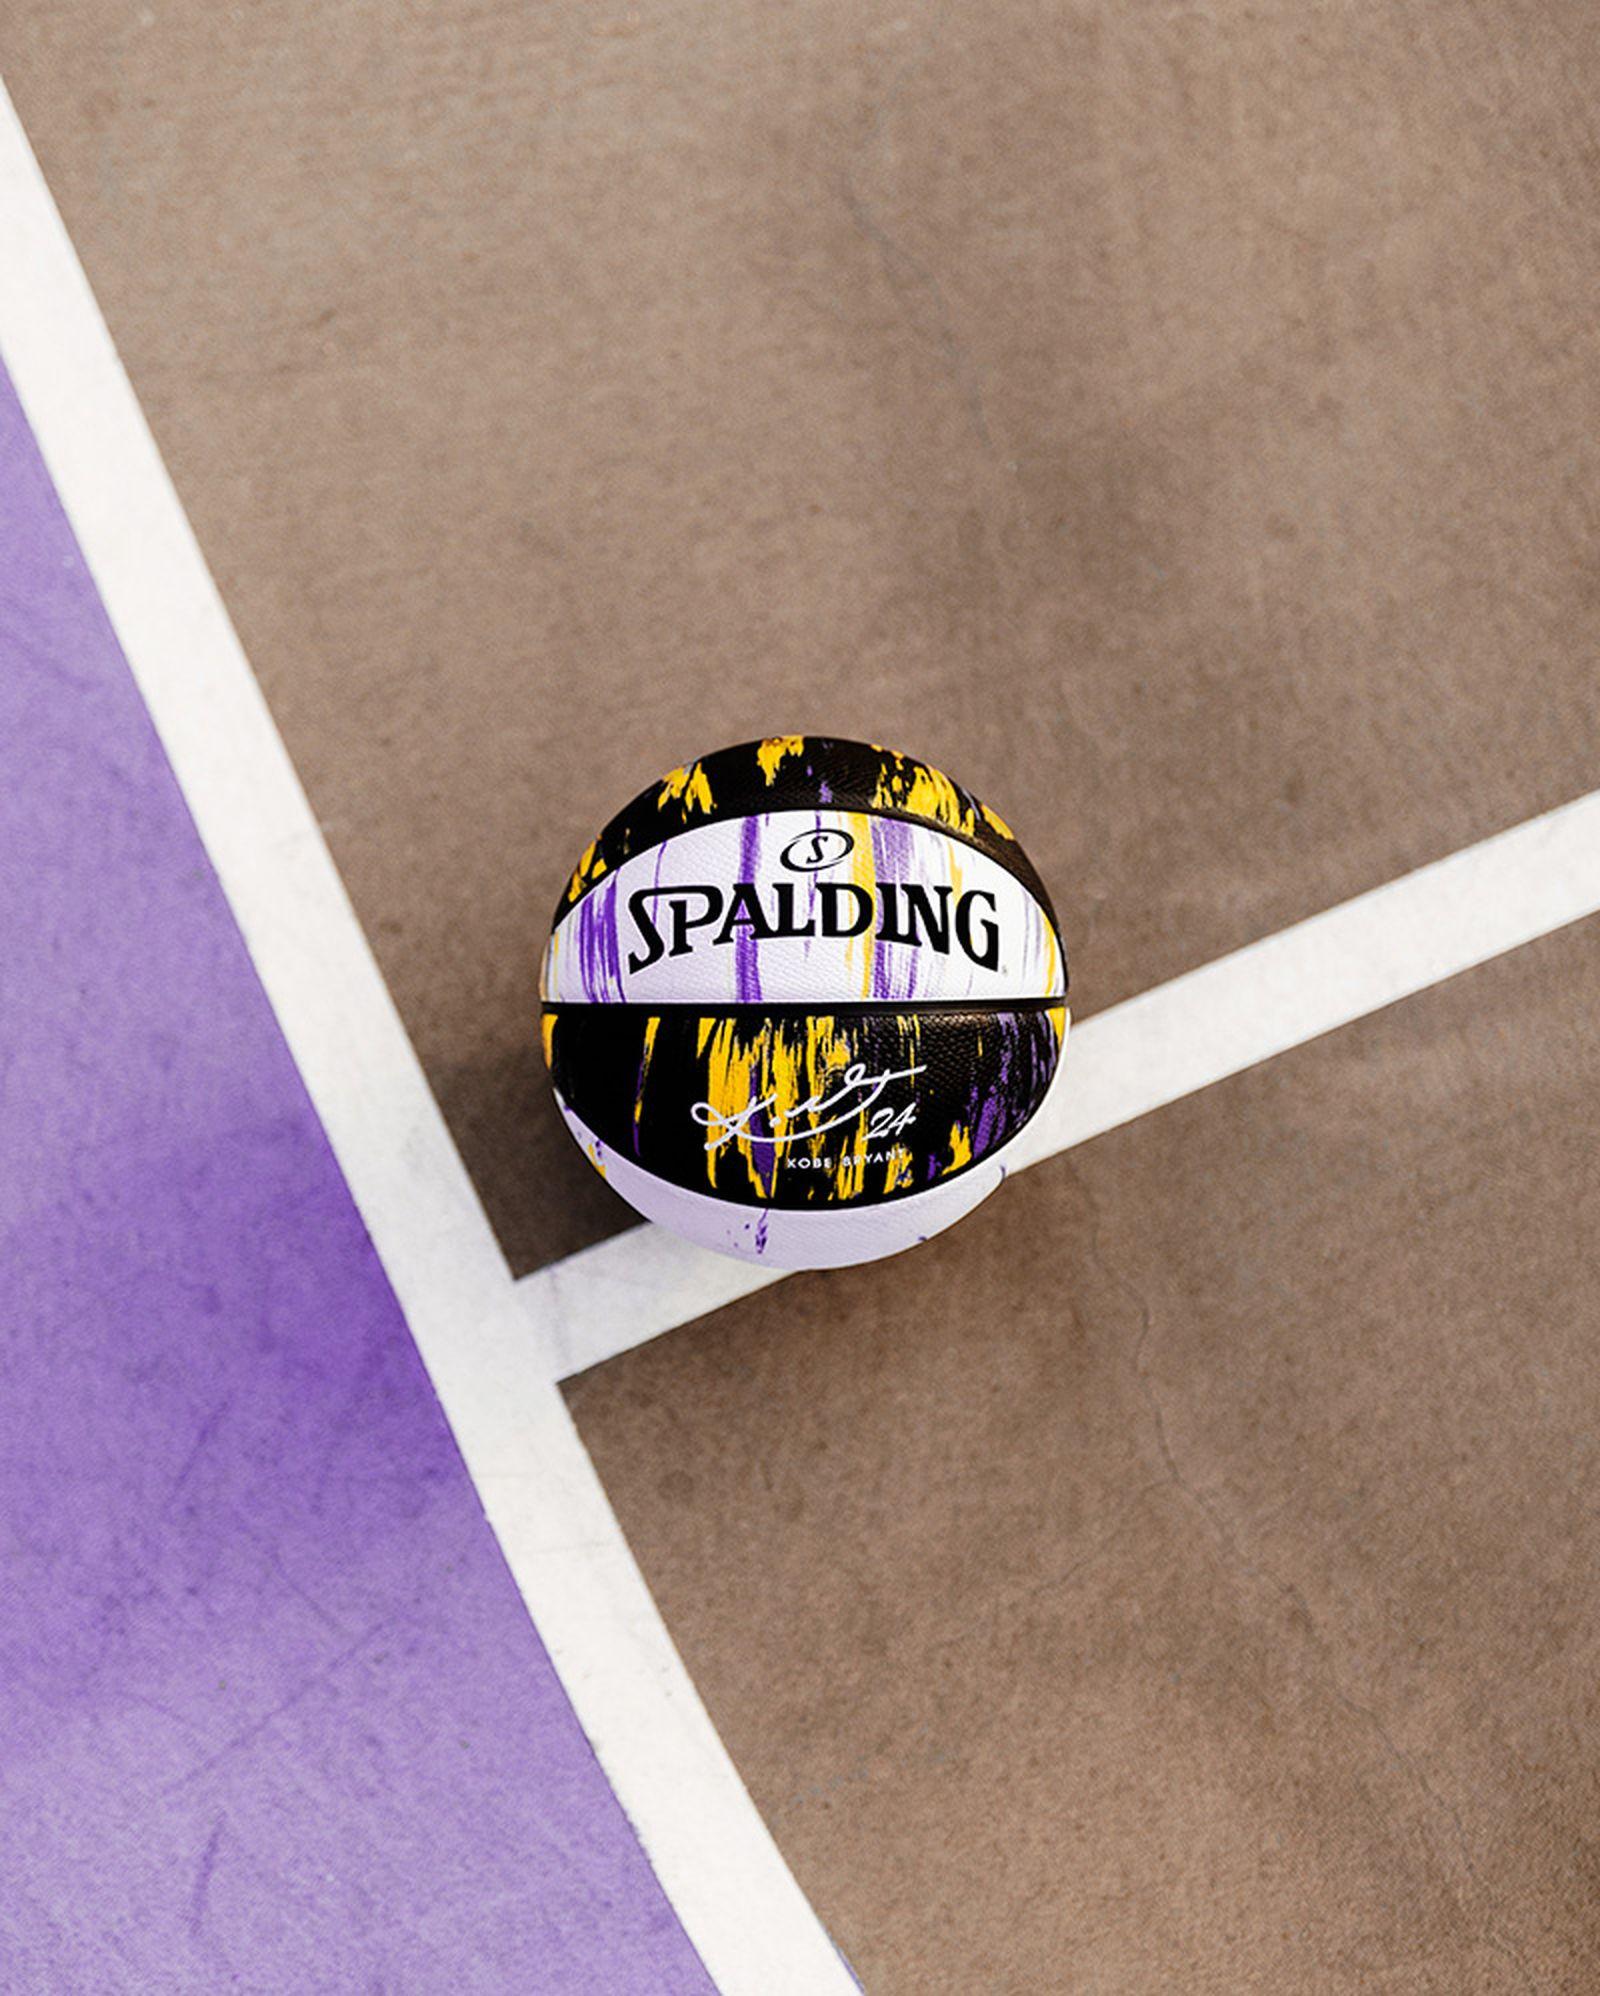 spalding-kobe-bryant-marbled-snake-basketball-01